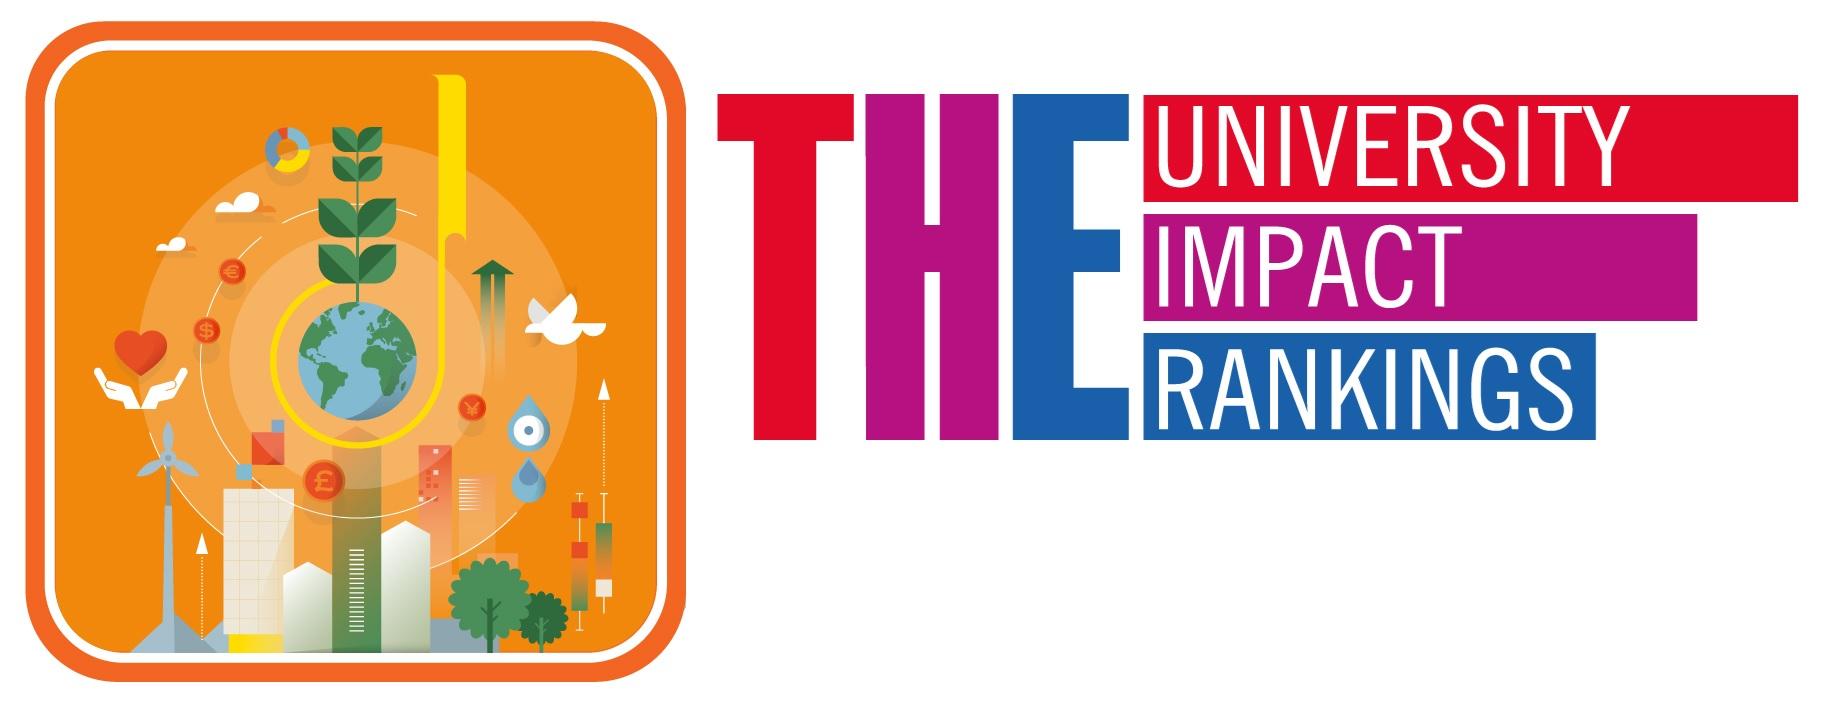 2019 THE University Impact Rankings